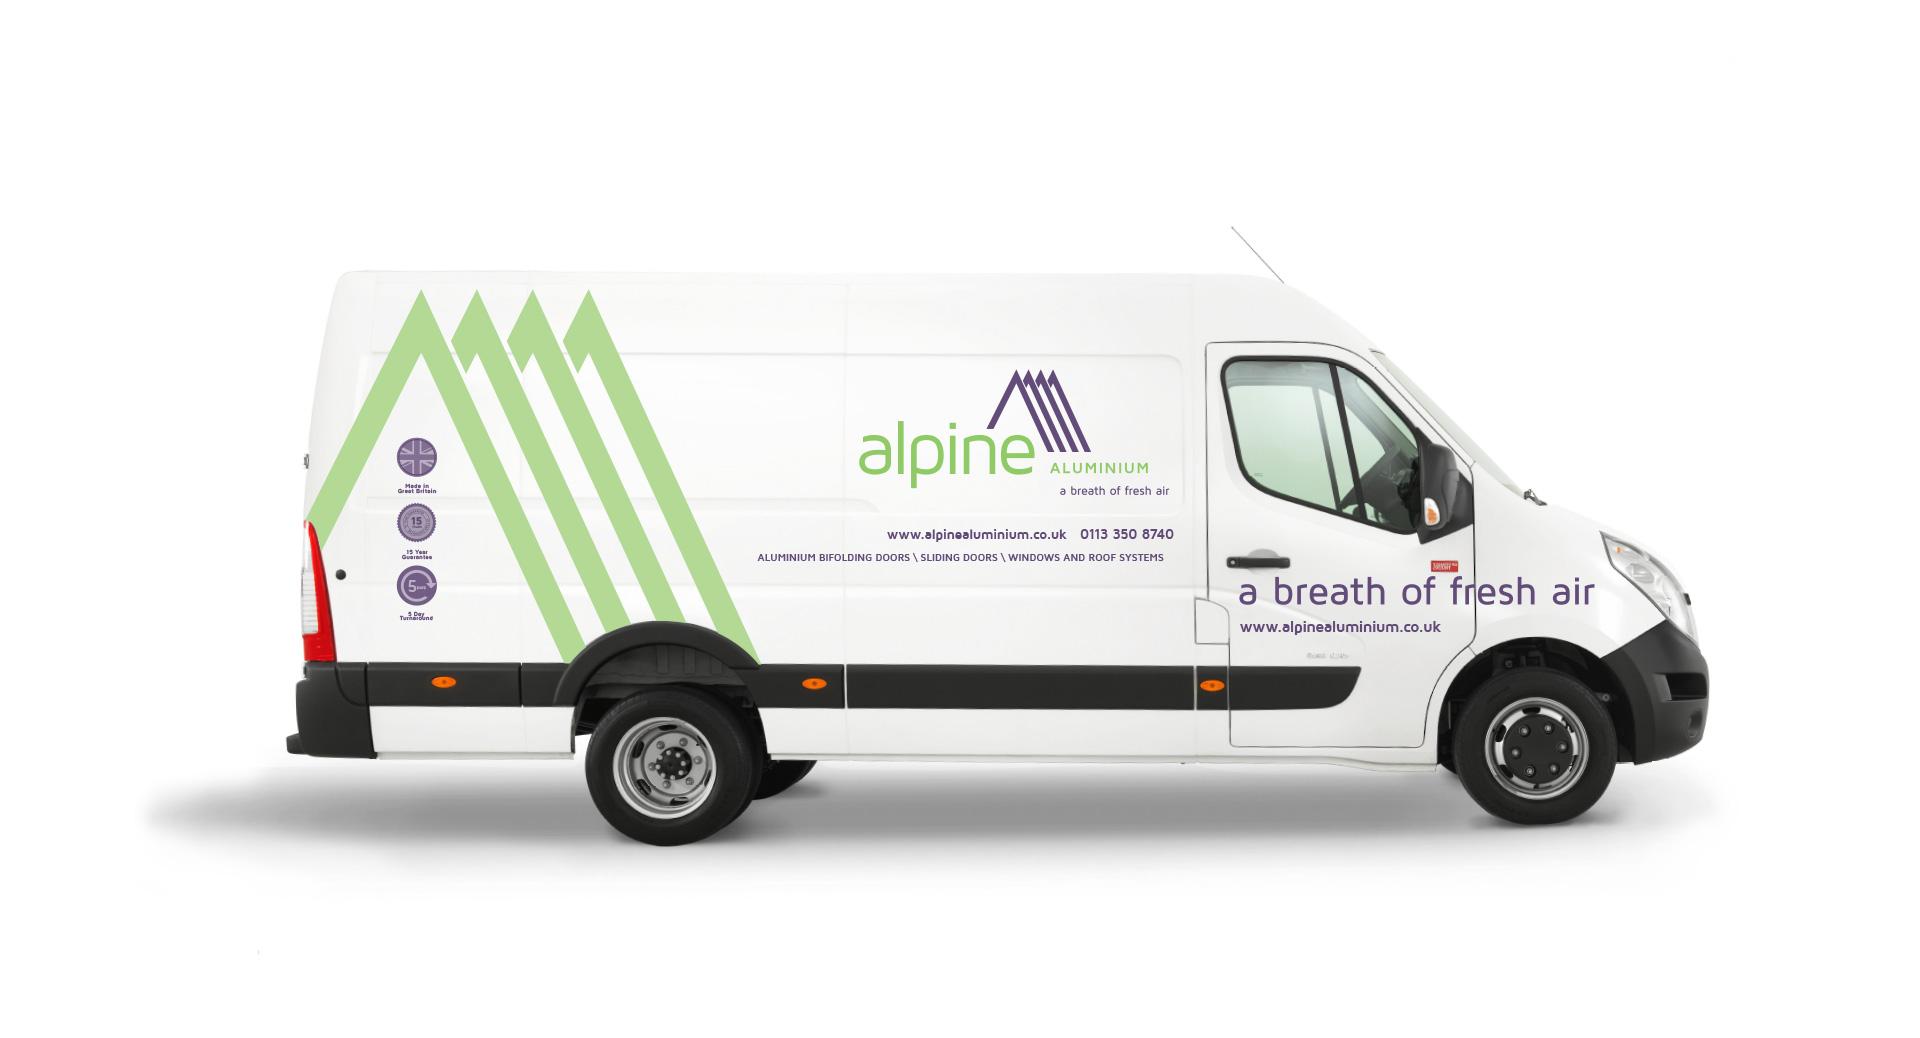 alpine branded vehicle